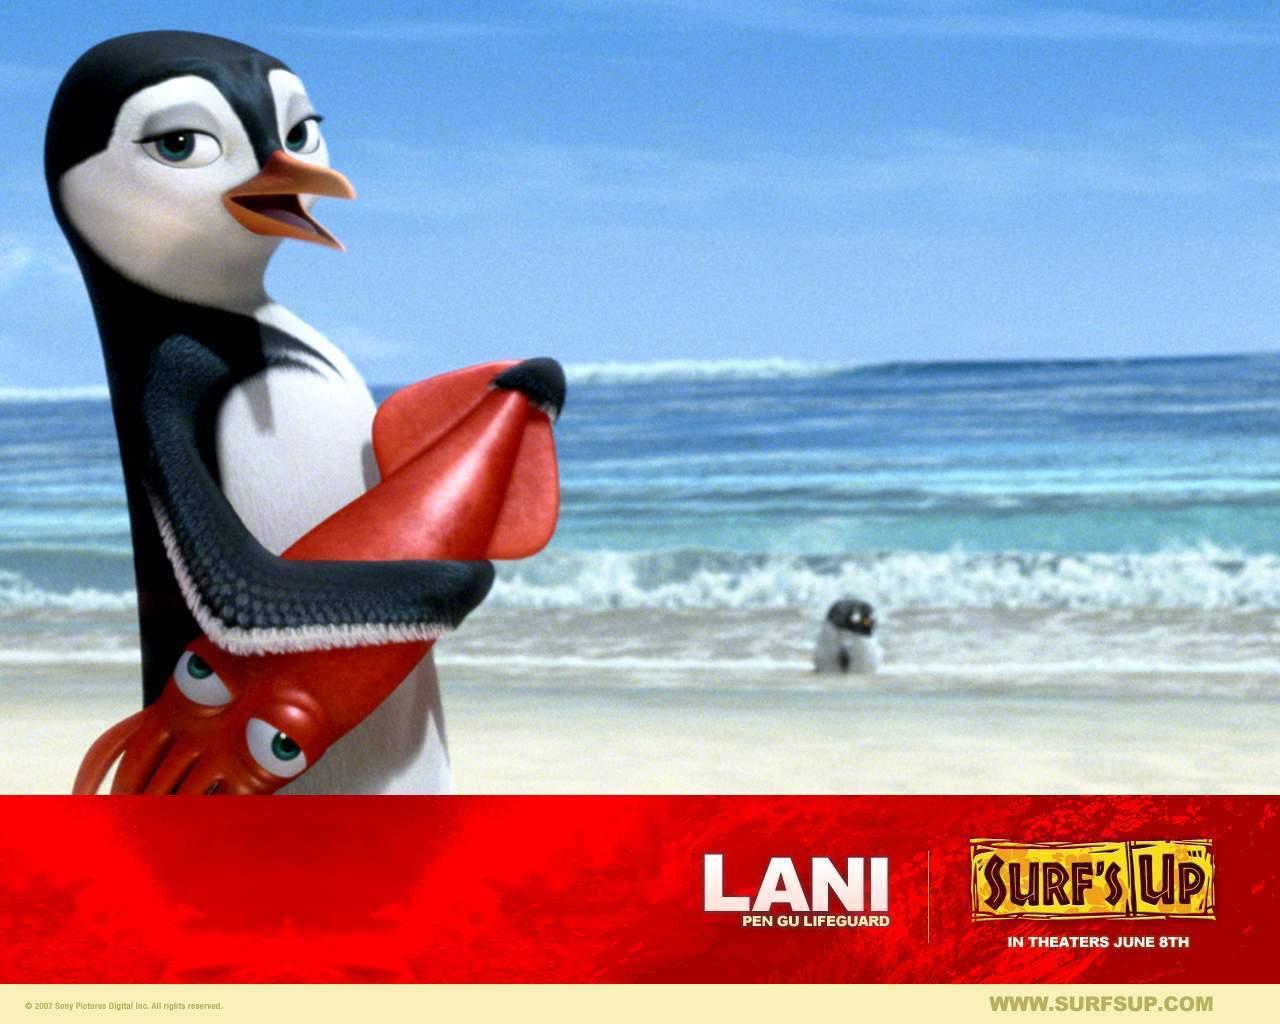 Lani Surf S Up Wallpaper 1609280 Fanpop